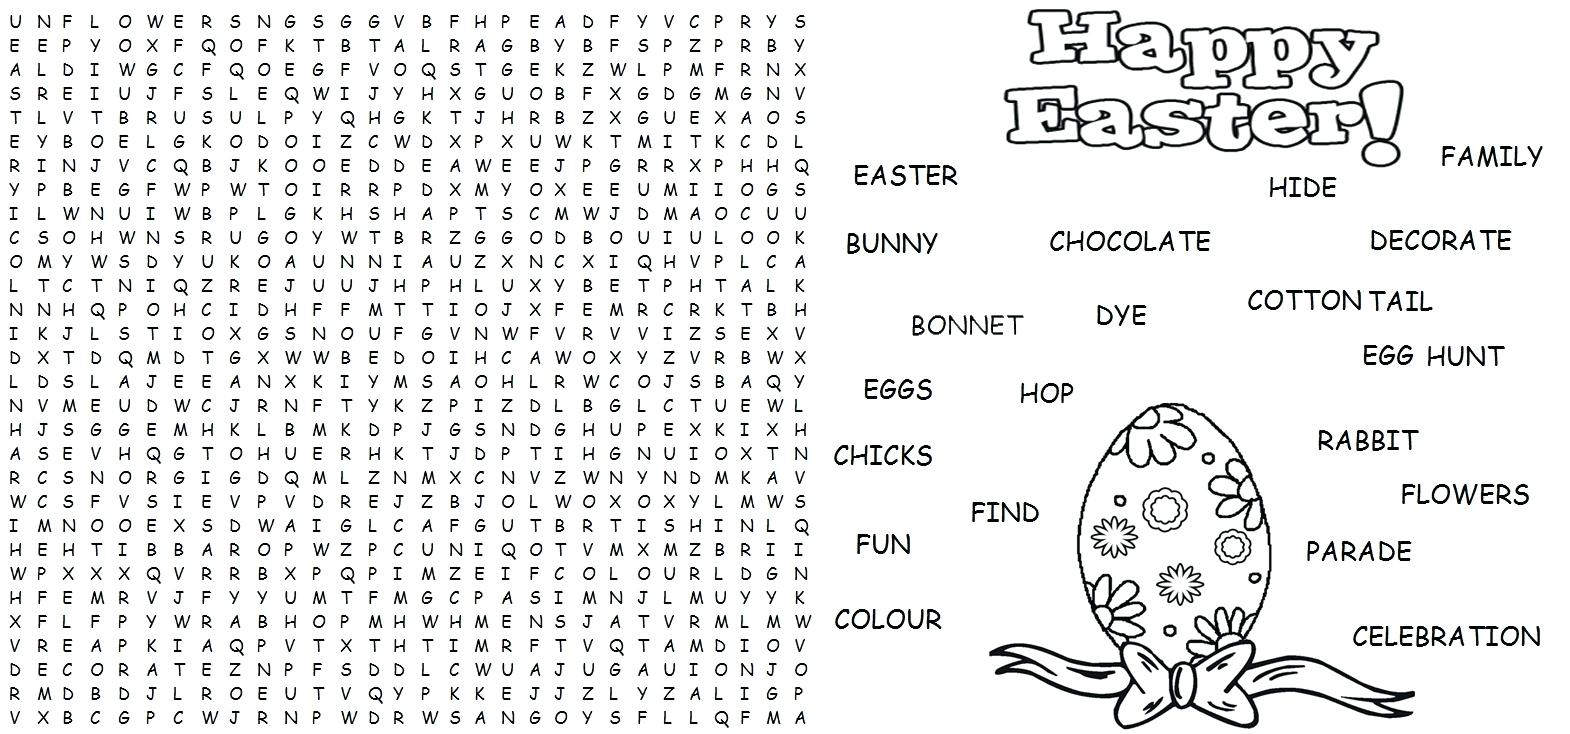 Handy Printable Word Search Hard | Sherry's Blog